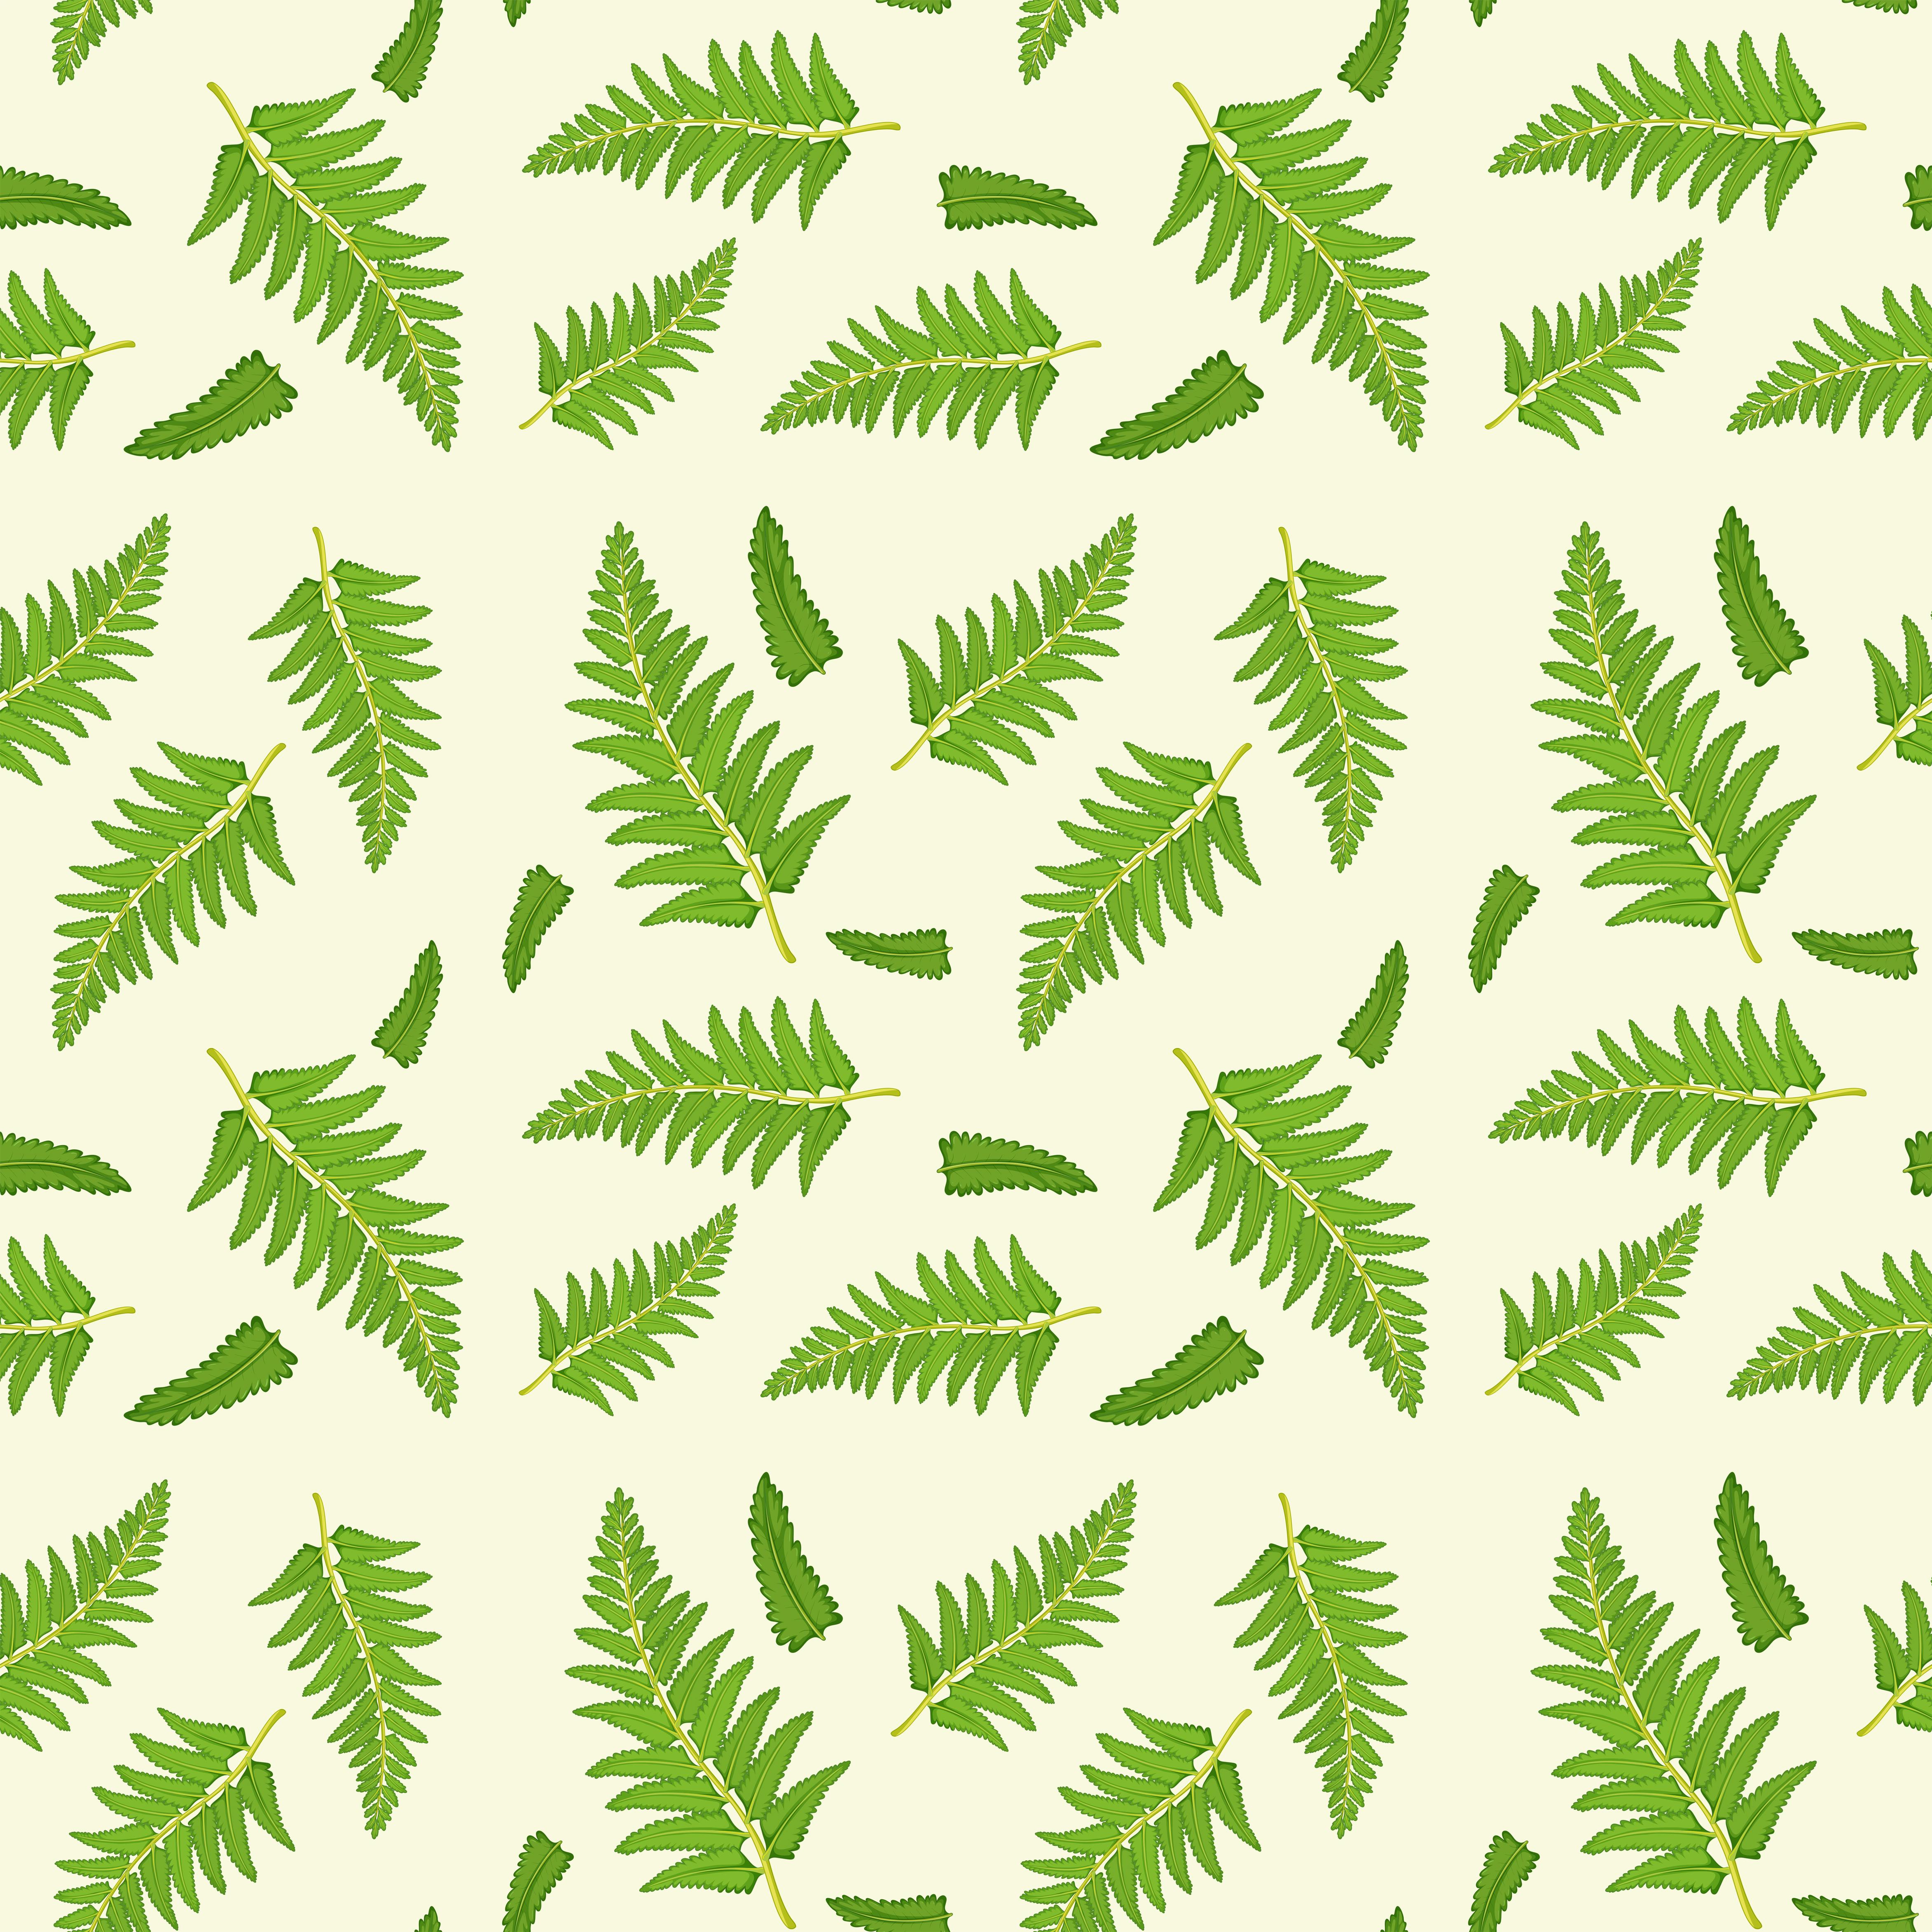 Fern Leaves Free Vector Art